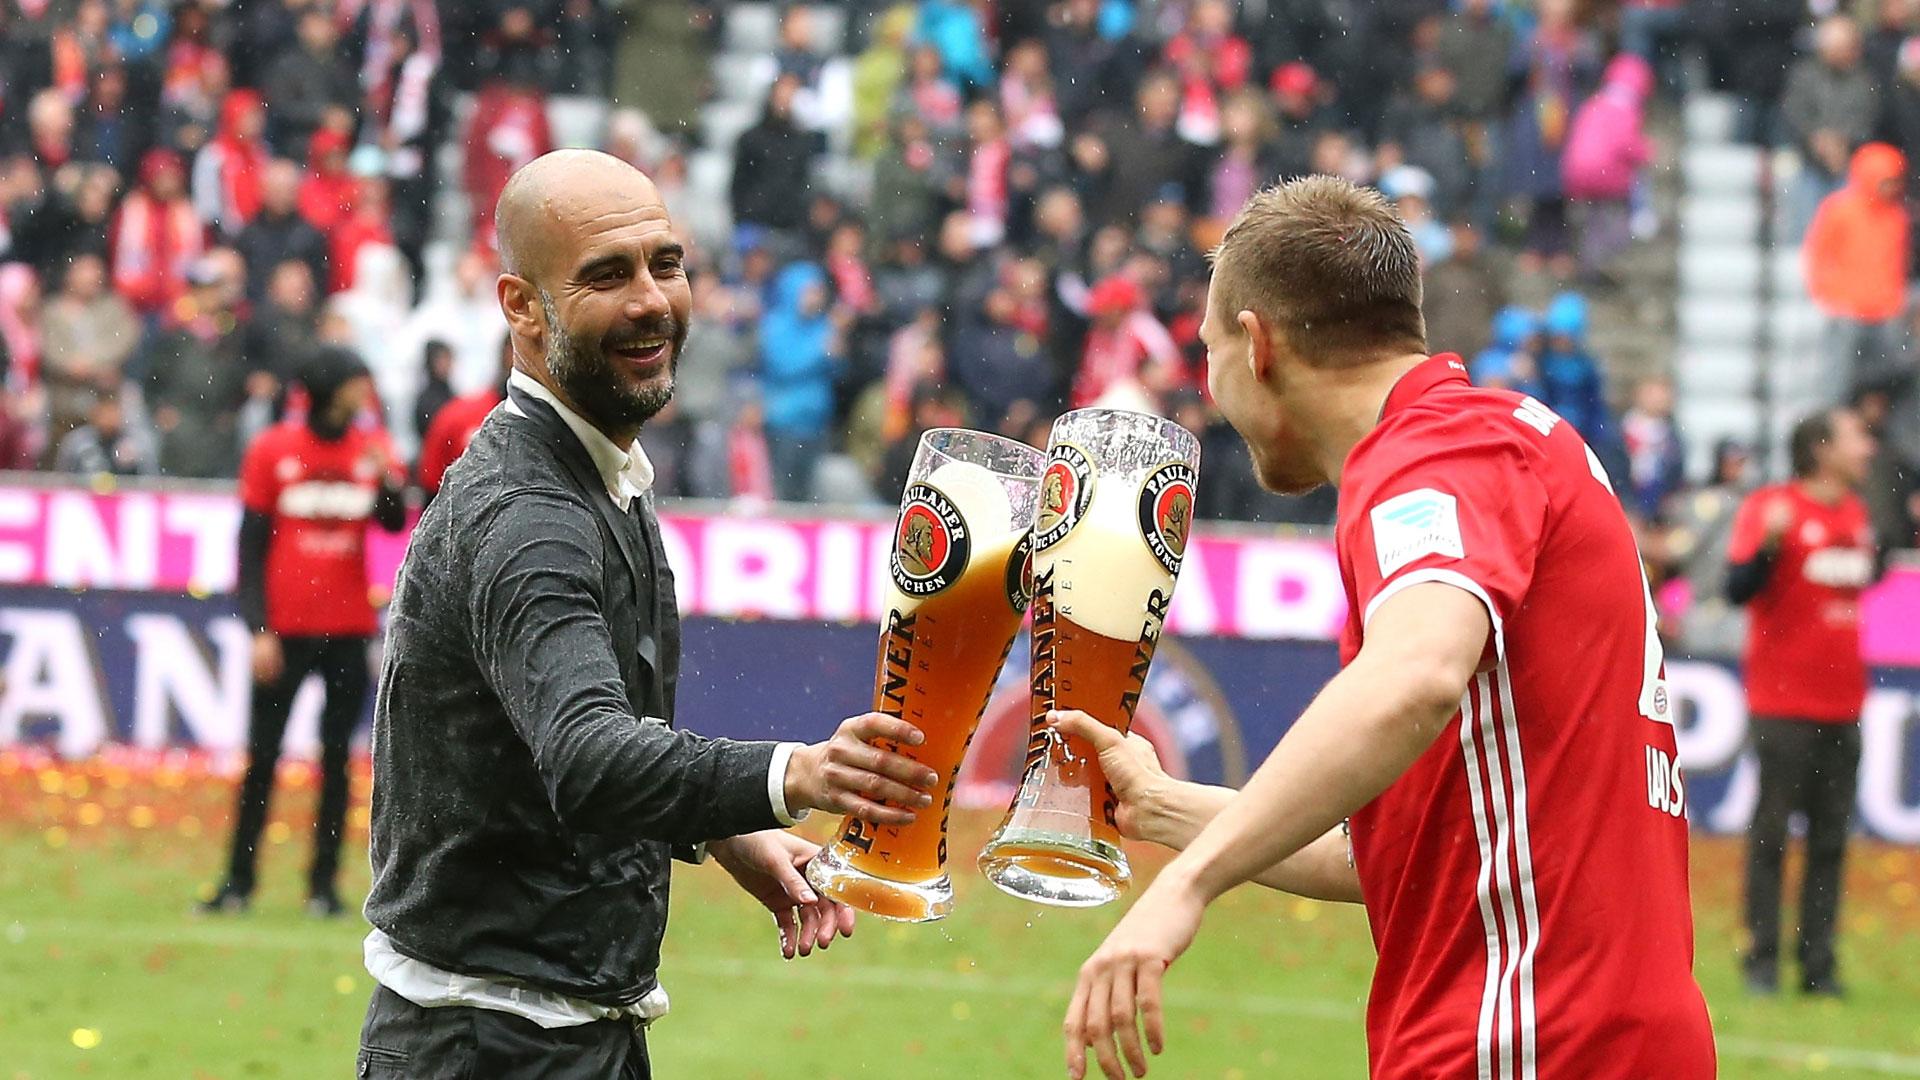 Pep Guardiola tried to sign Real Madrid star at Bayern Munich